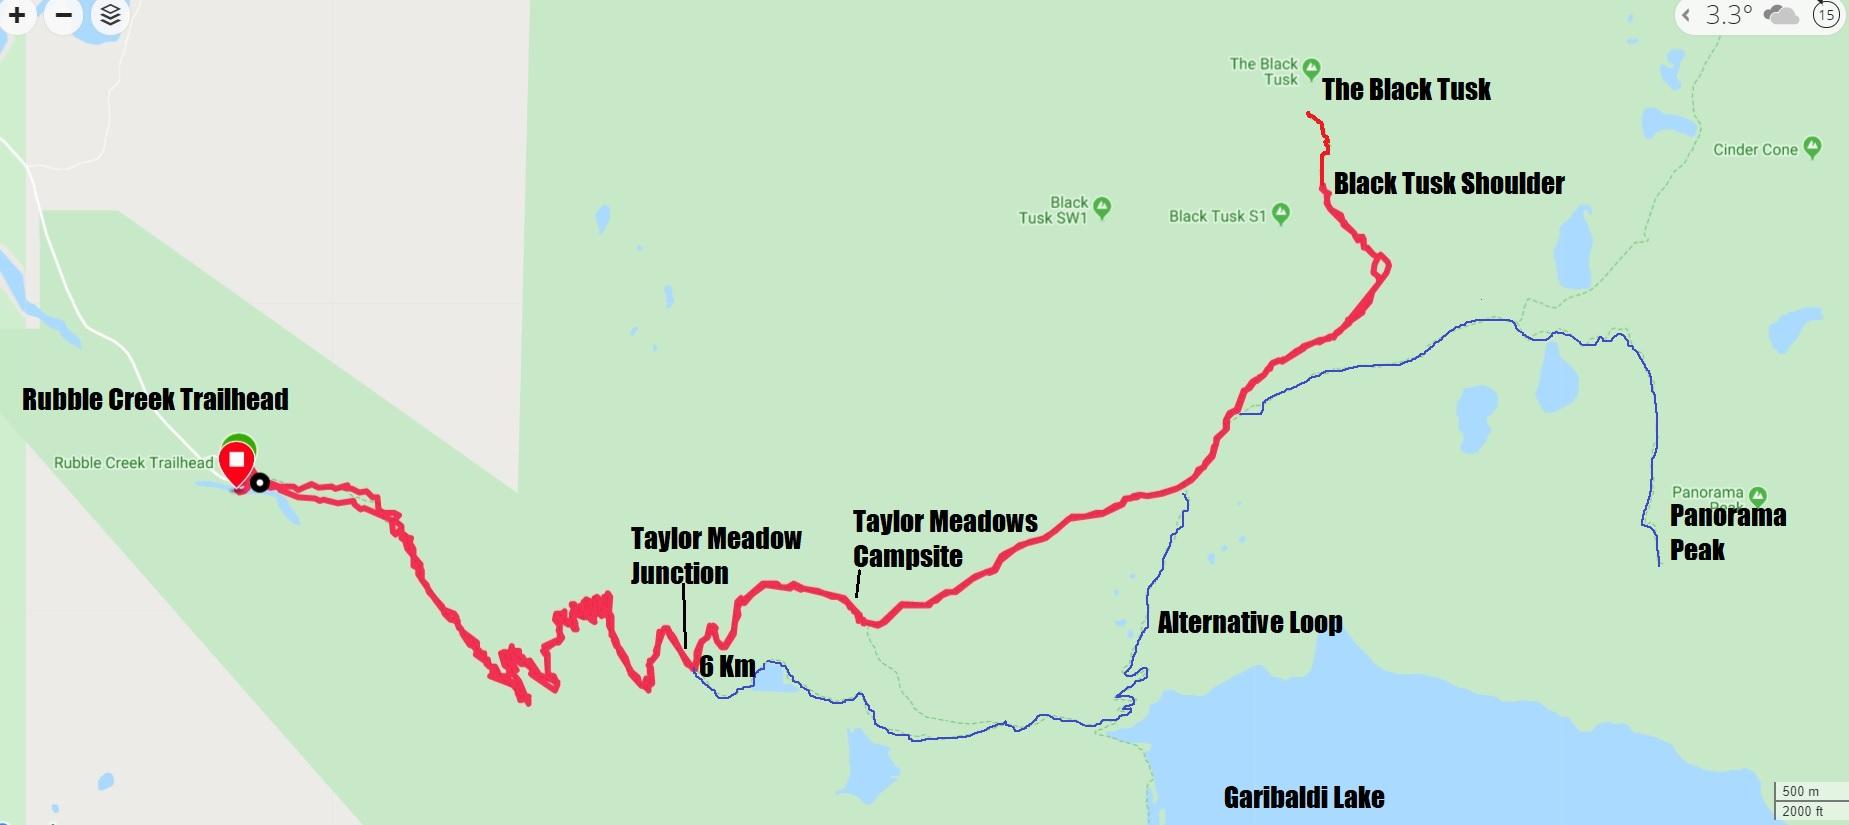 Hiking Map to Black Tusk in Garibaldi National Park